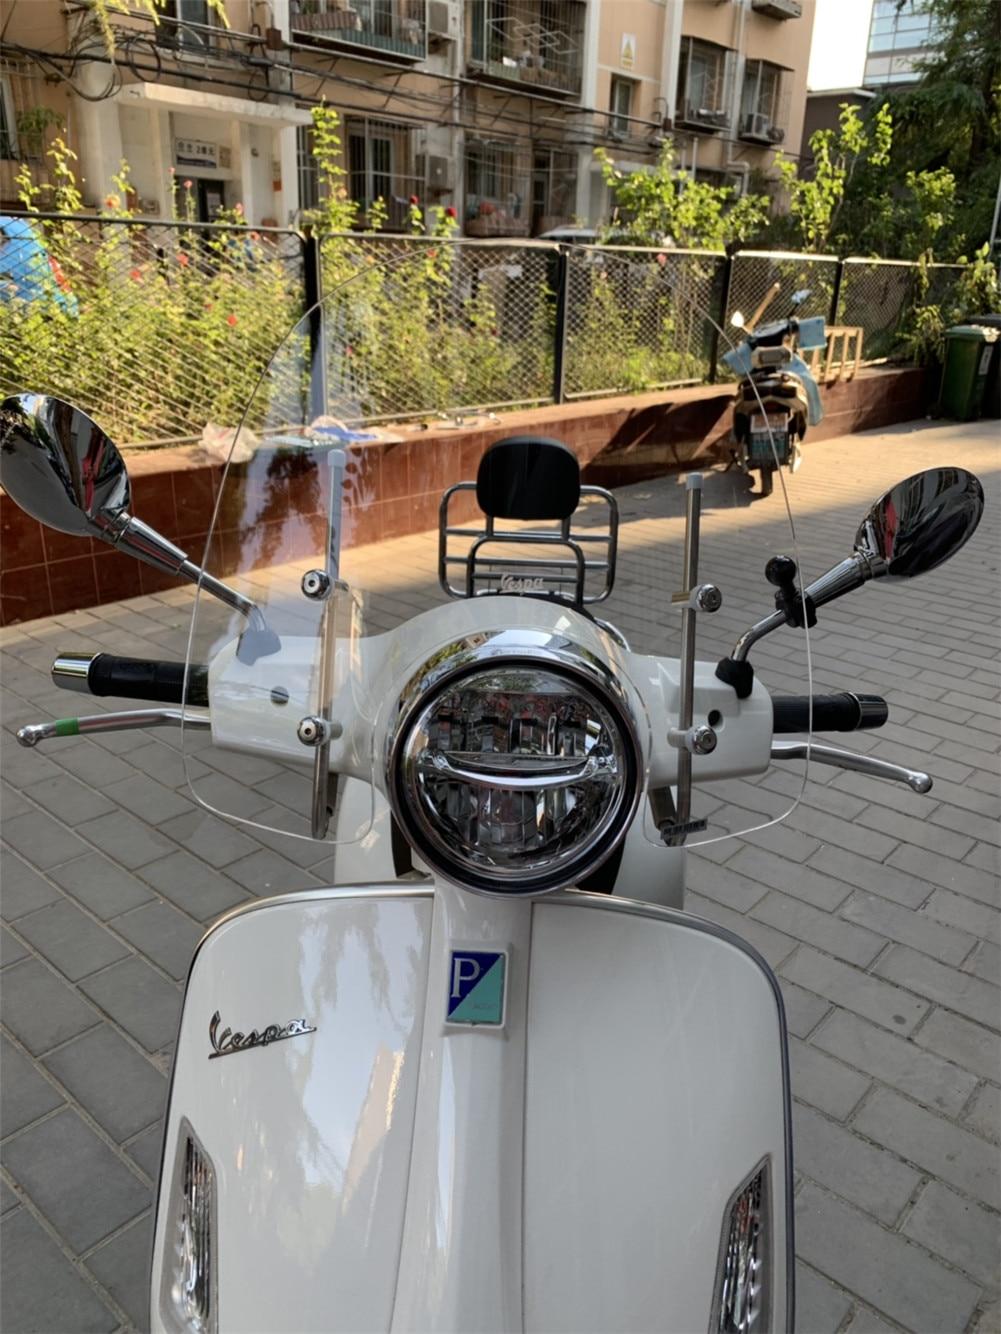 Accesorios para Scooter, Deflector de aire, parabrisas, motocicleta, Vespa GTS 300